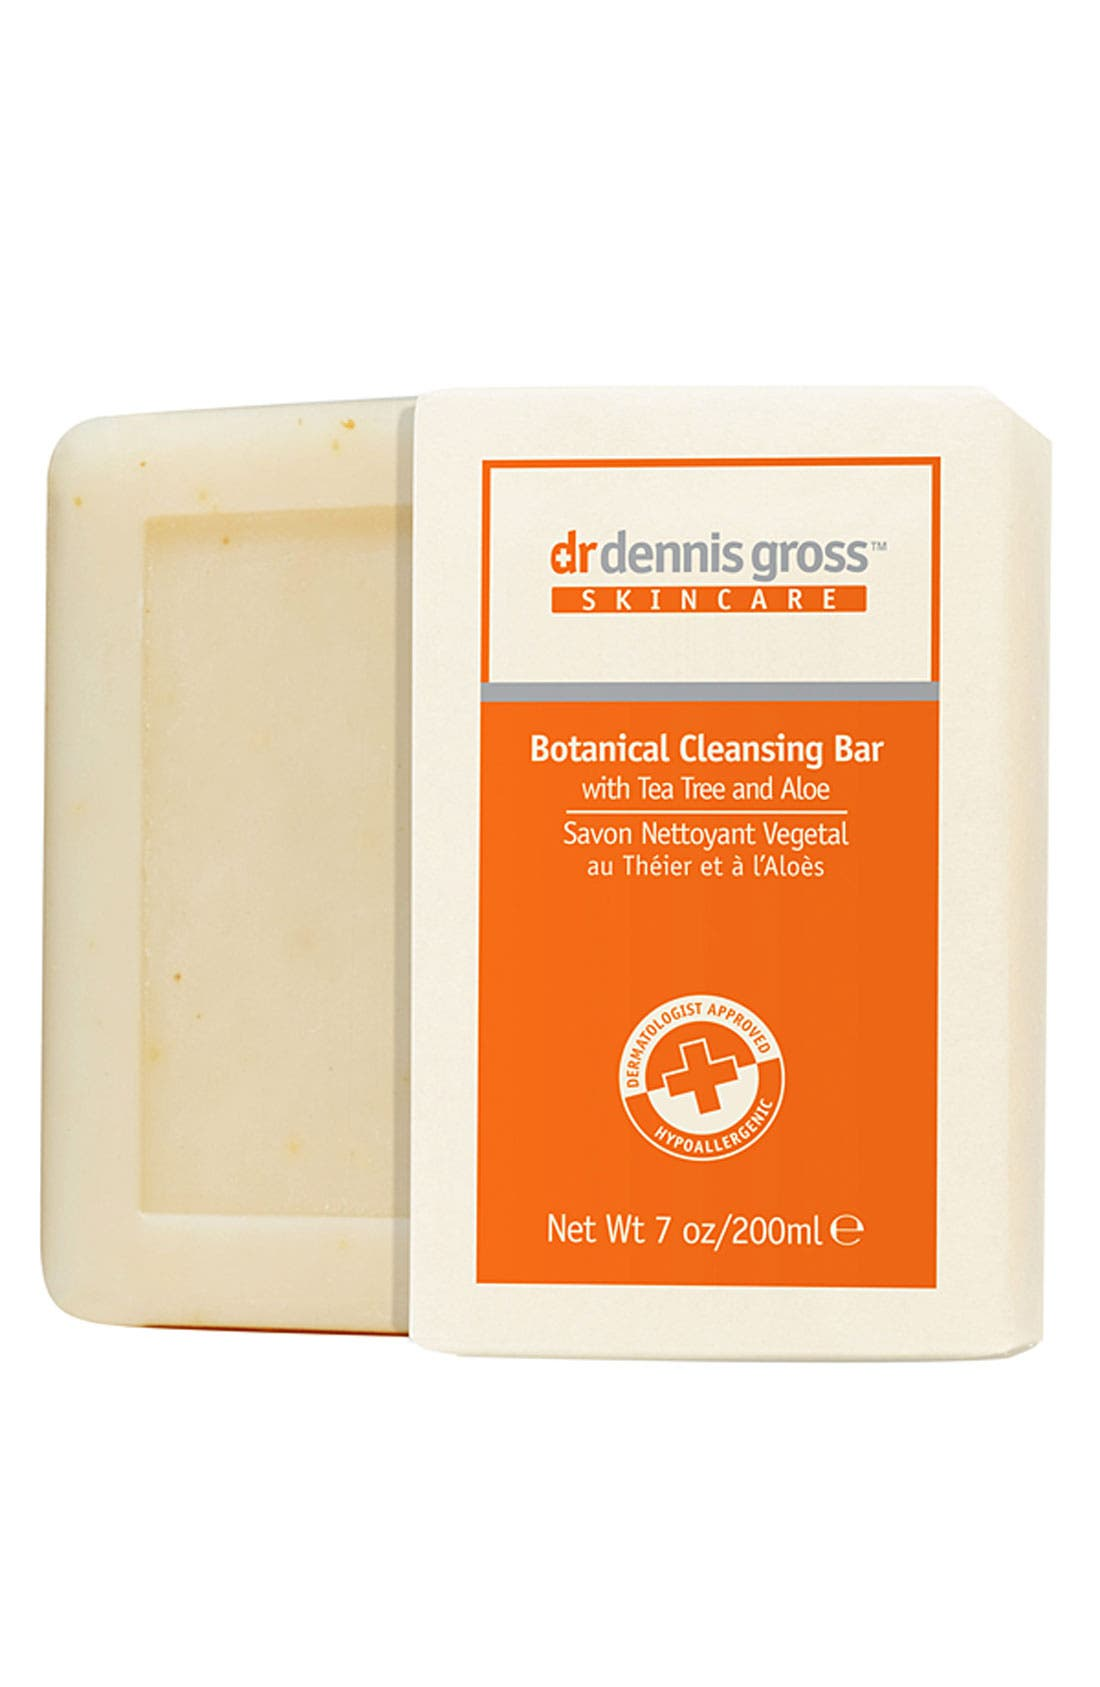 Dr. Dennis Gross Skincare Botanical Cleansing Bar with Tea Tree & Aloe